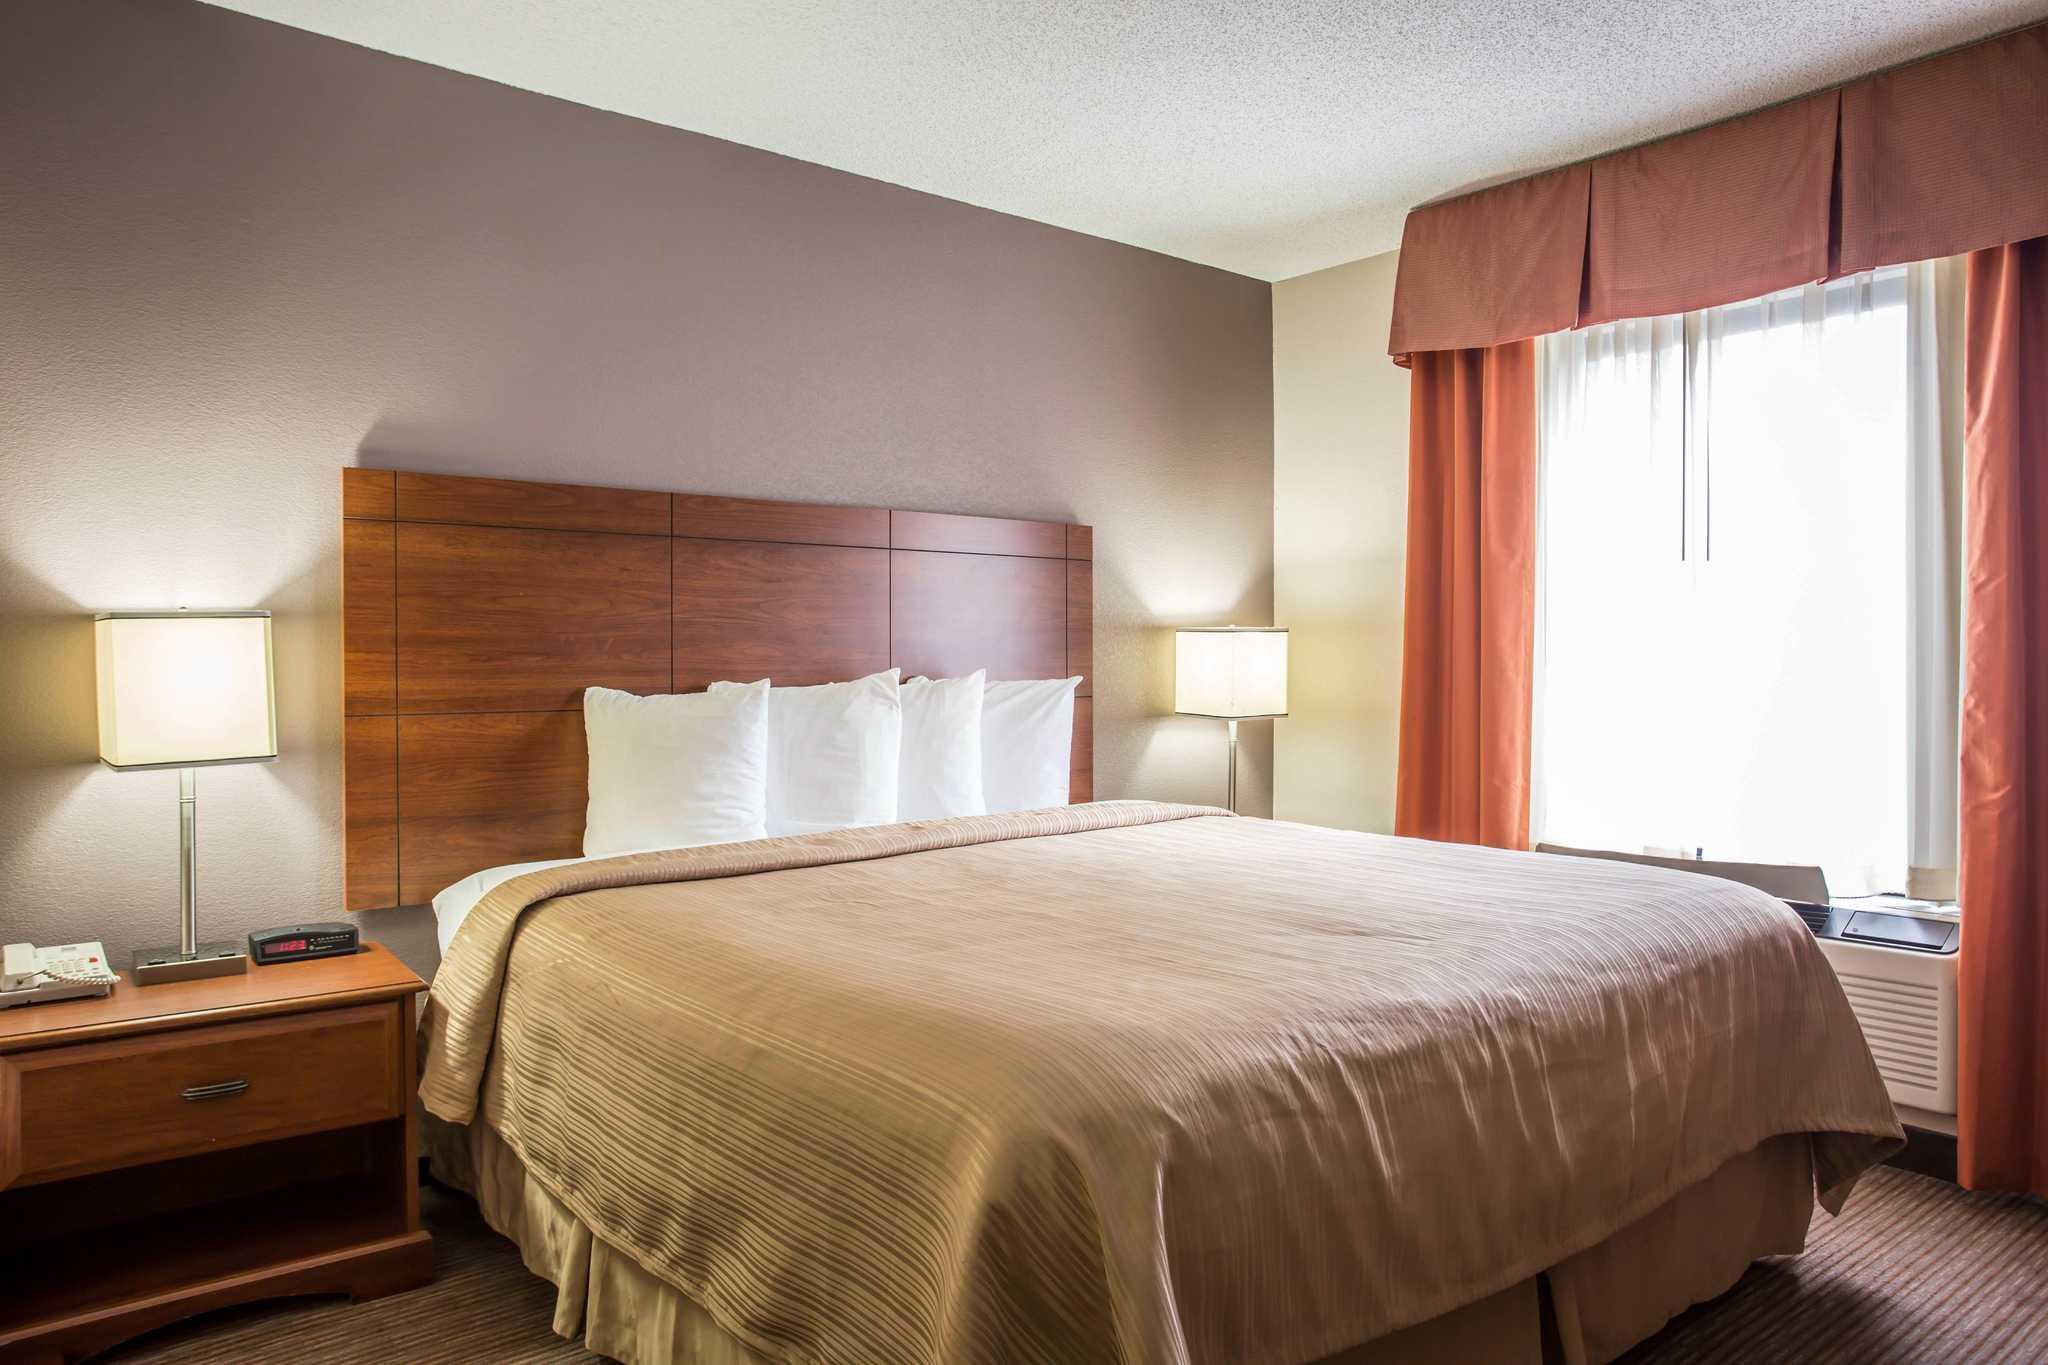 Quality Inn & Suites Matthews - Charlotte image 25